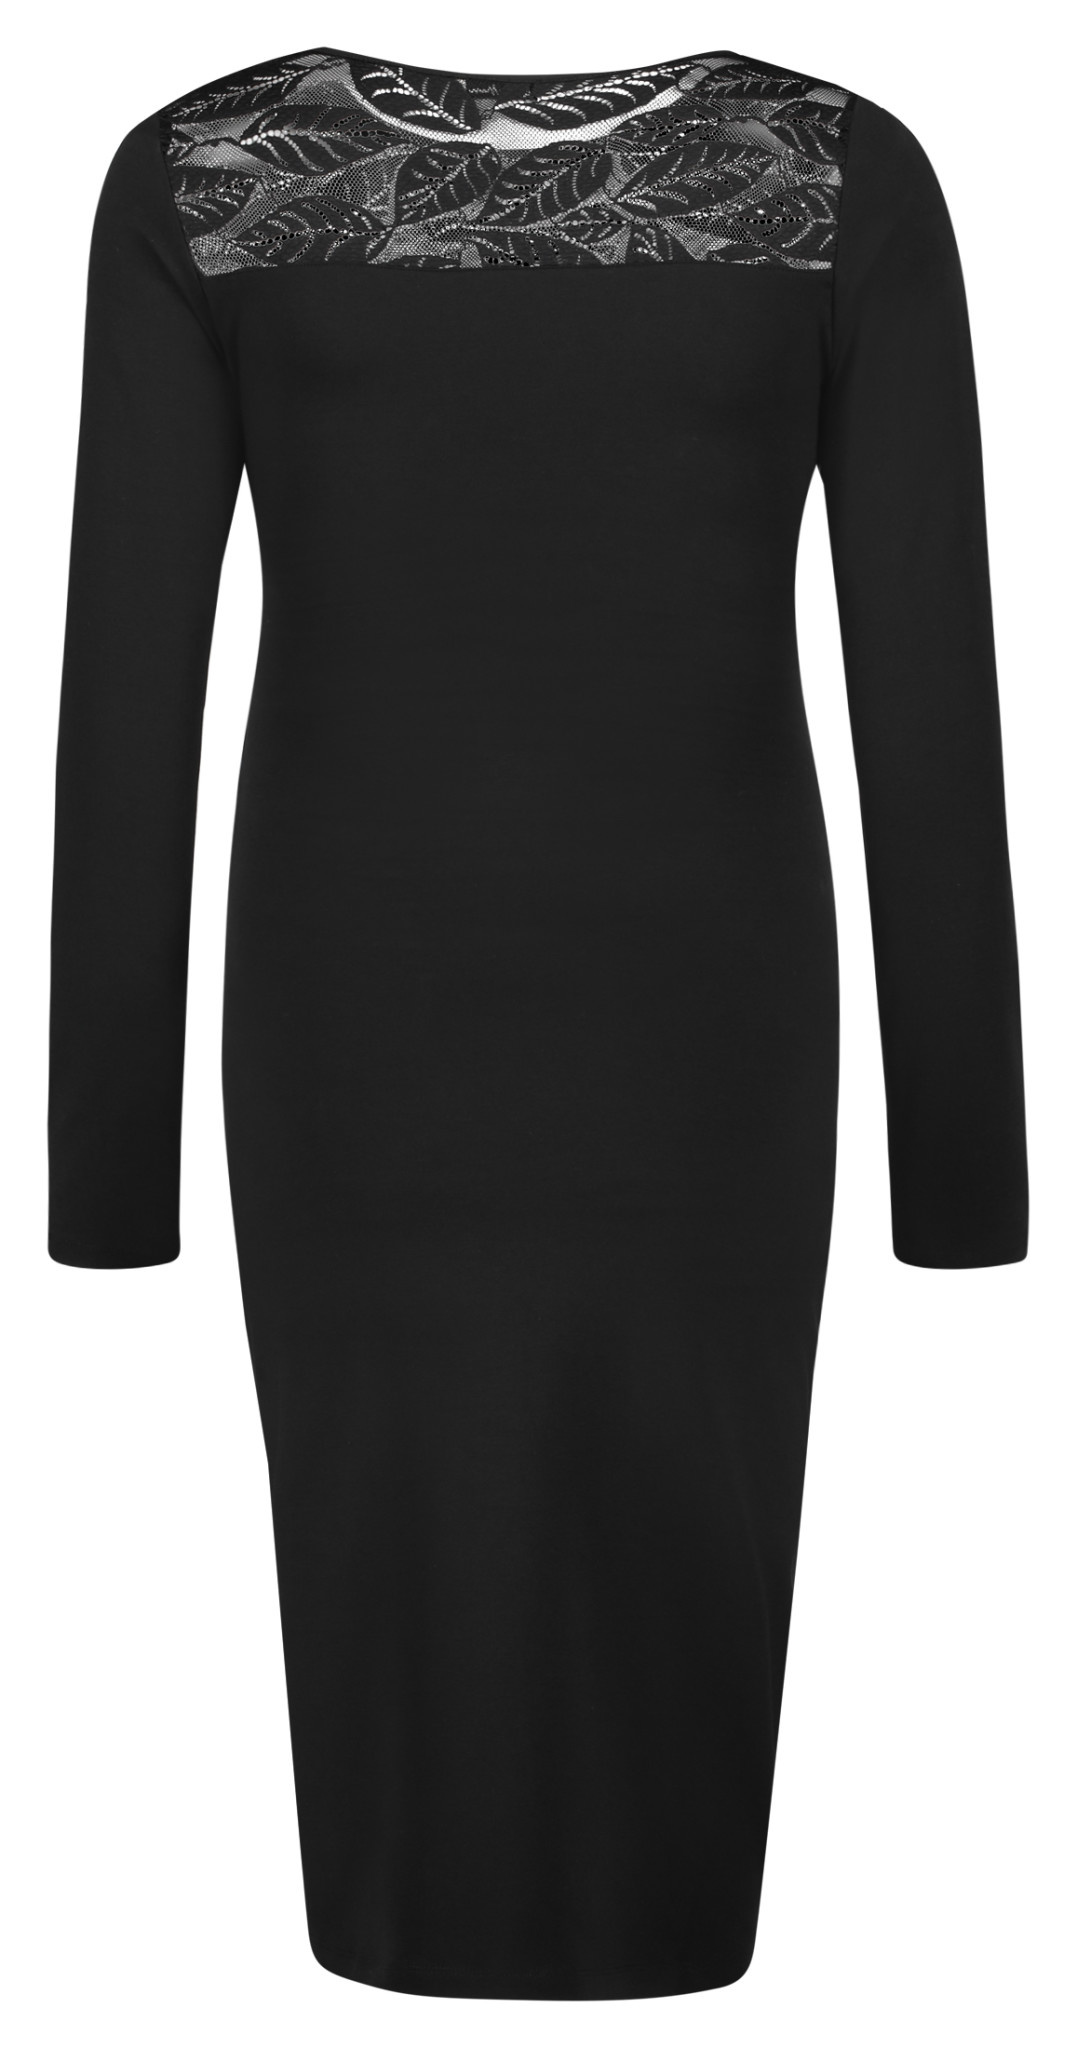 Queen Mum Dress Nursing Black